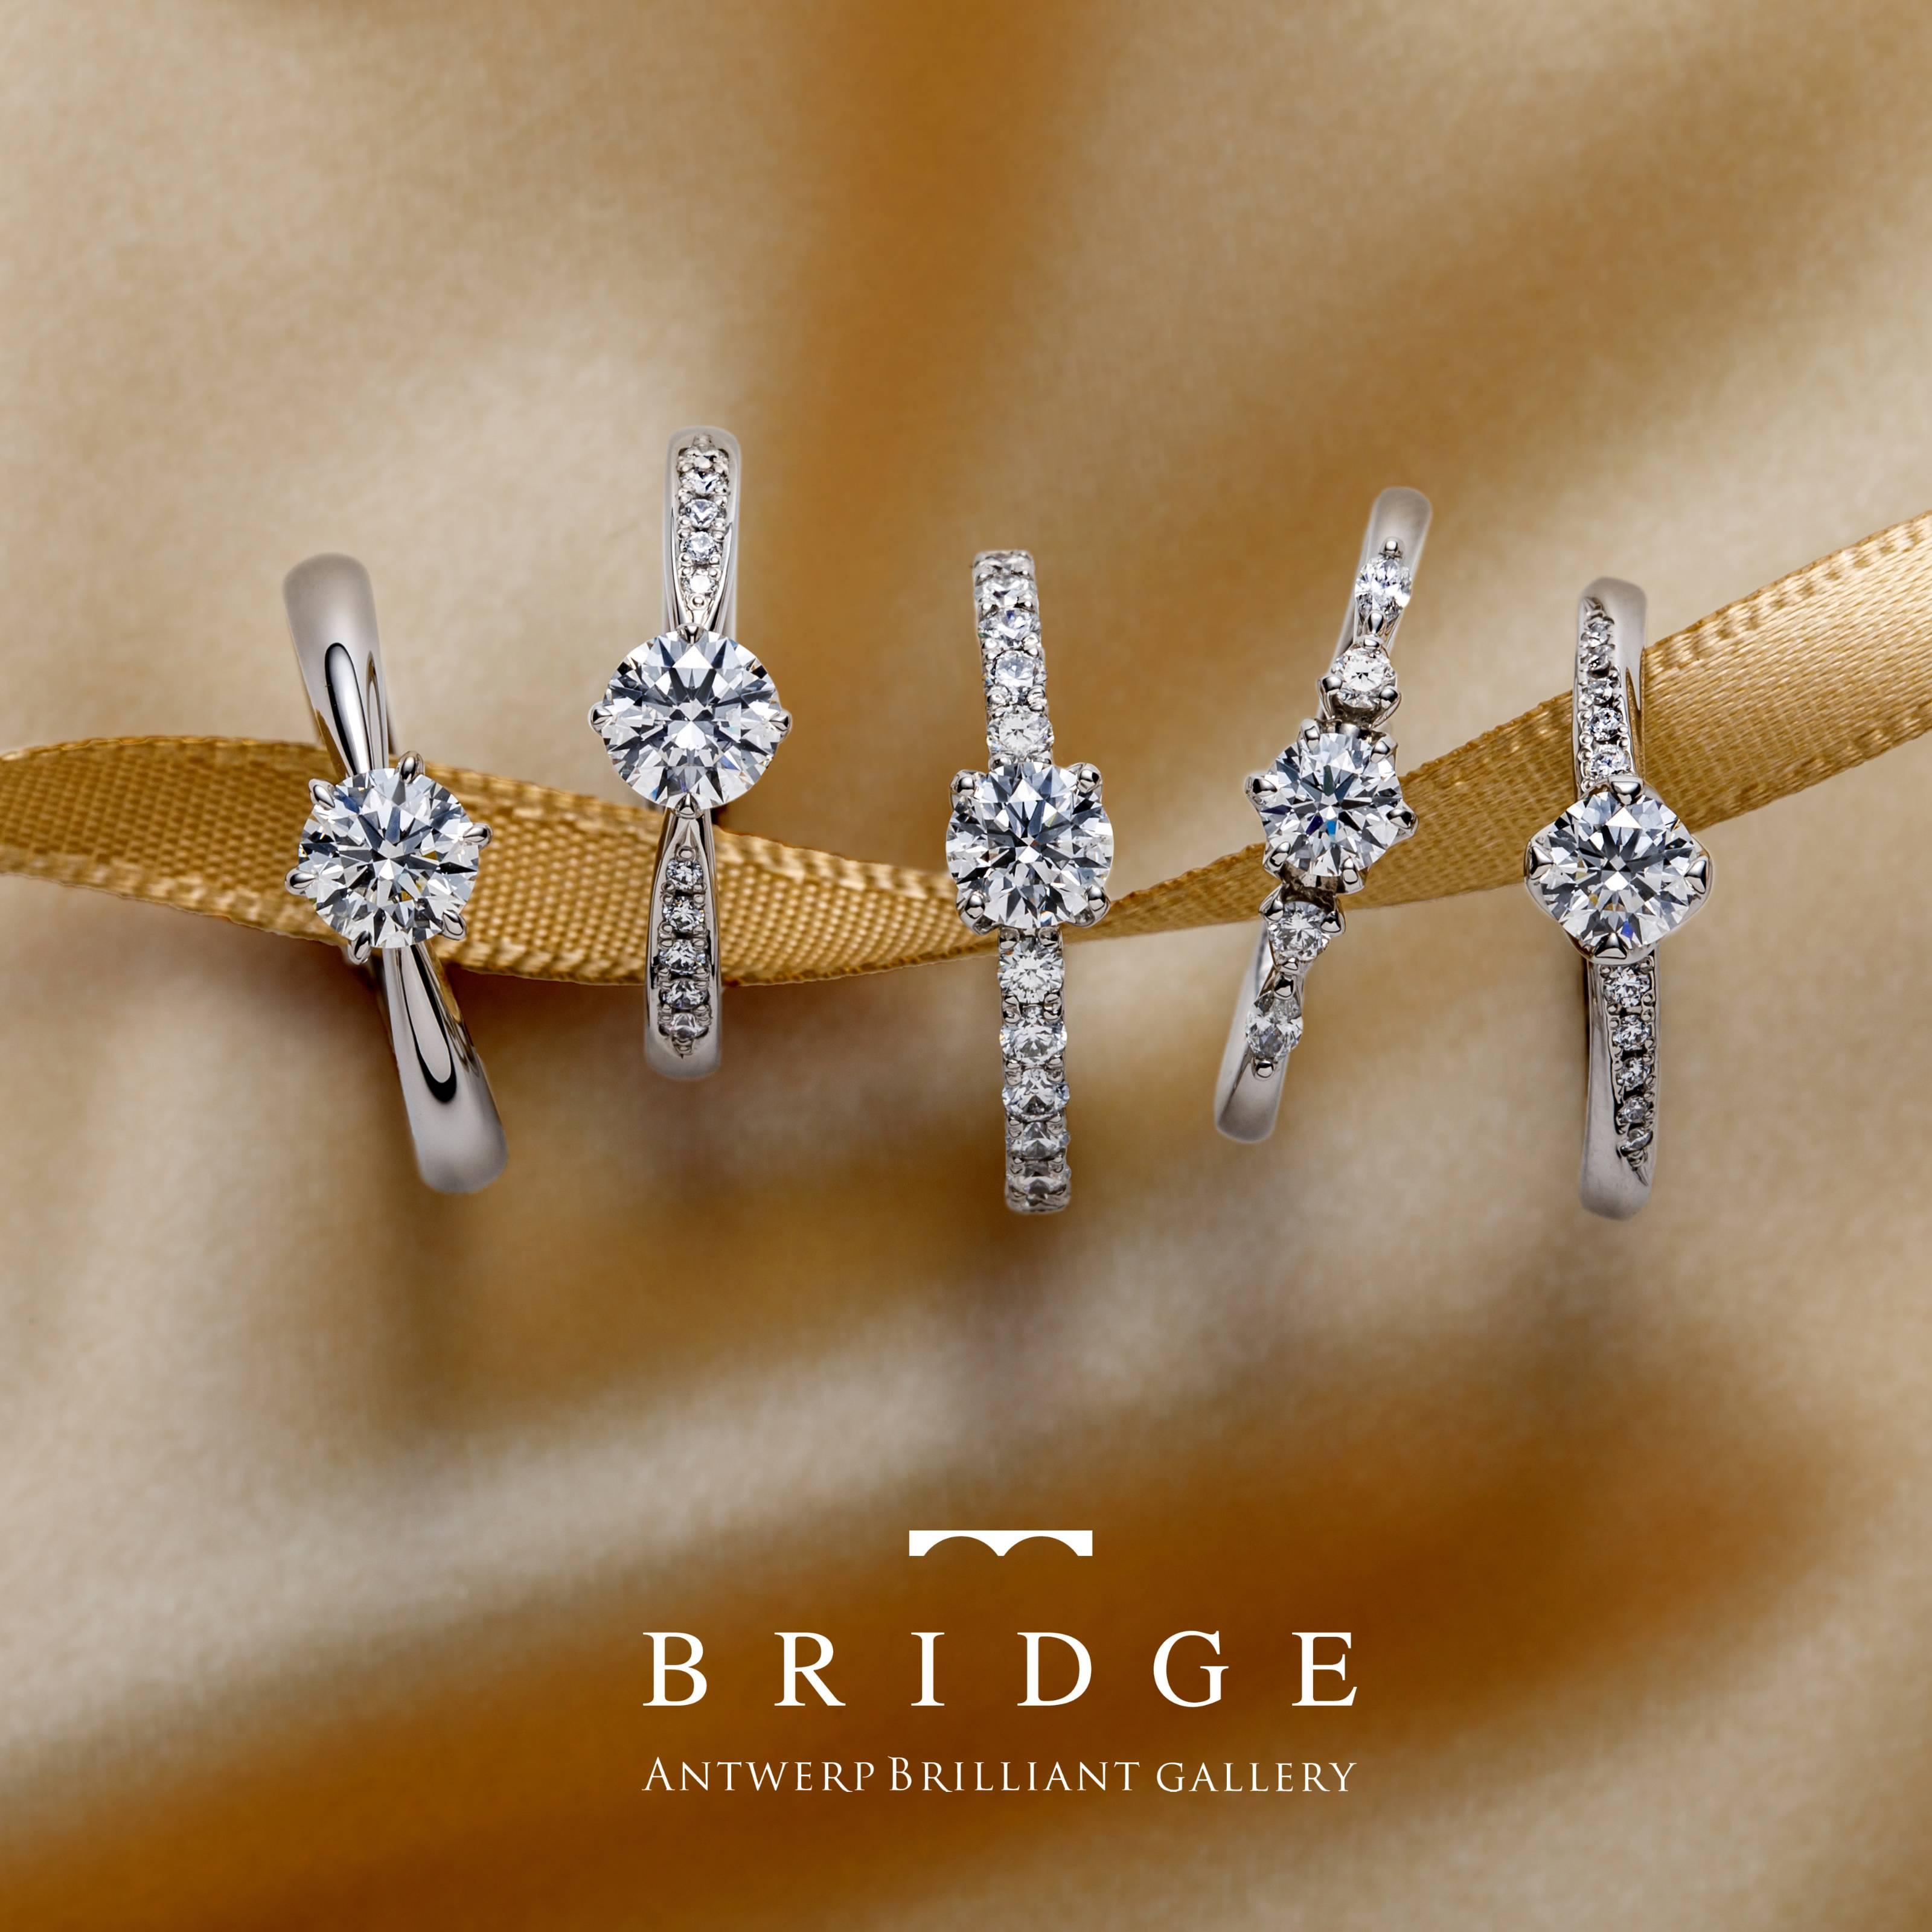 BRIDGE銀座(ブリッジ・D.A.P.T.株式会社)